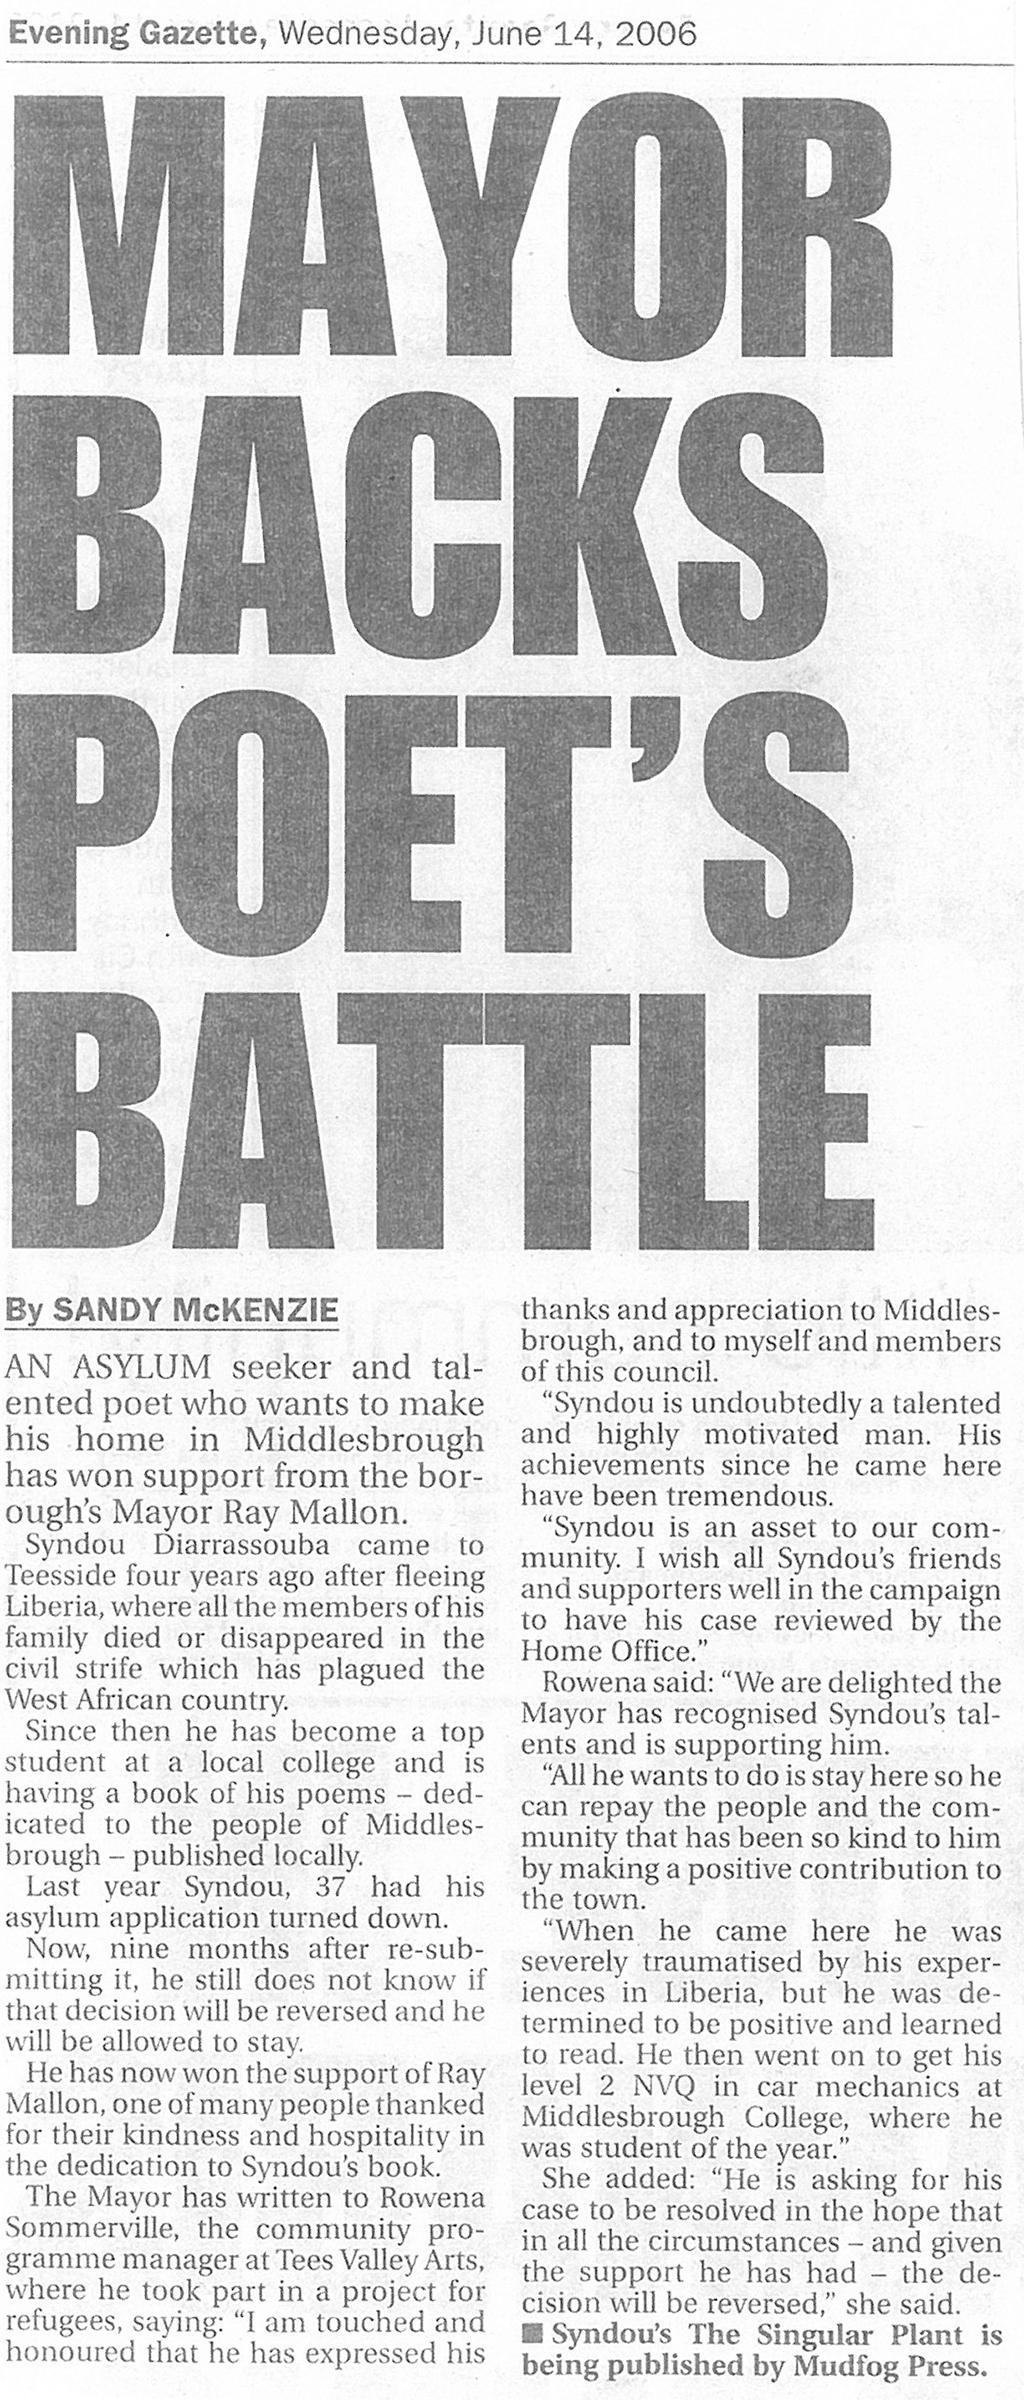 2006-06-14, Evening Gazette